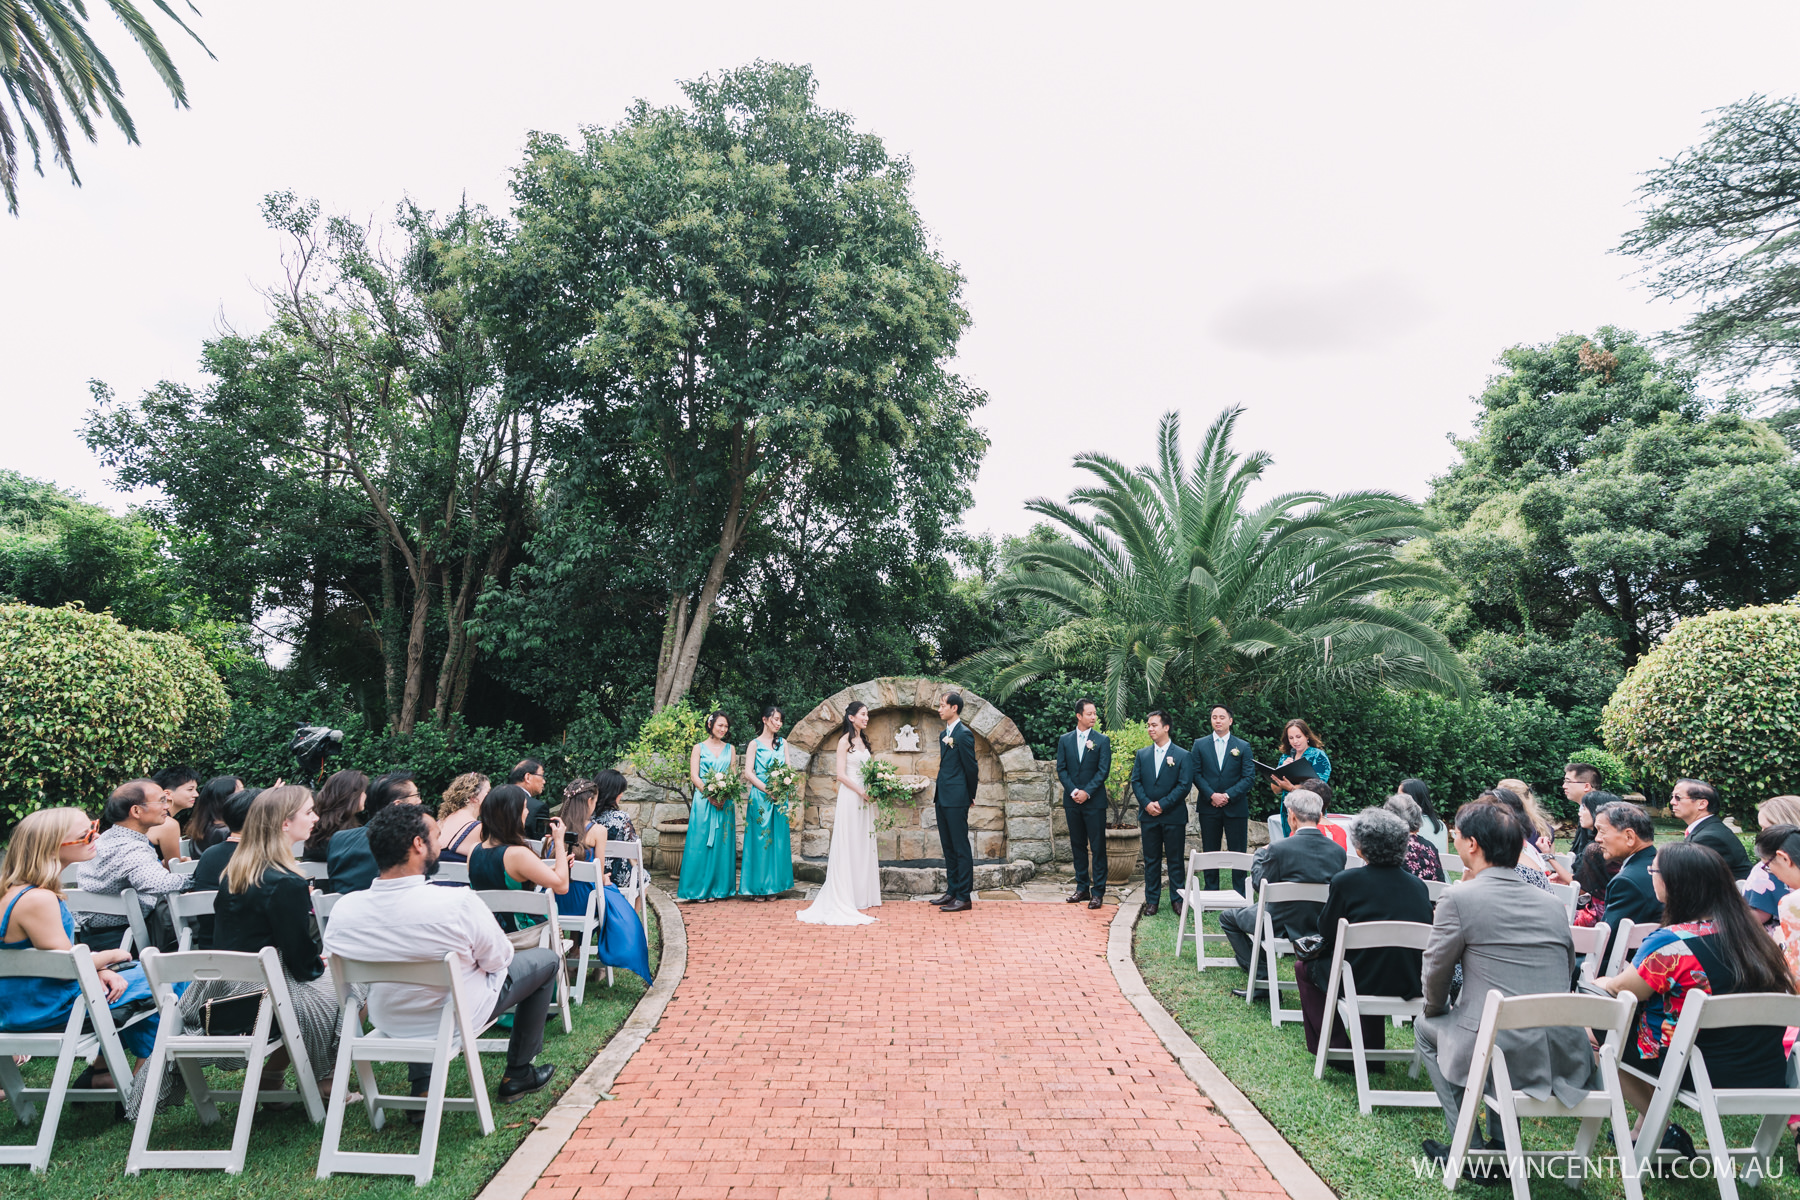 Enchanted Garden Wedding Ceremony at Oatlands House